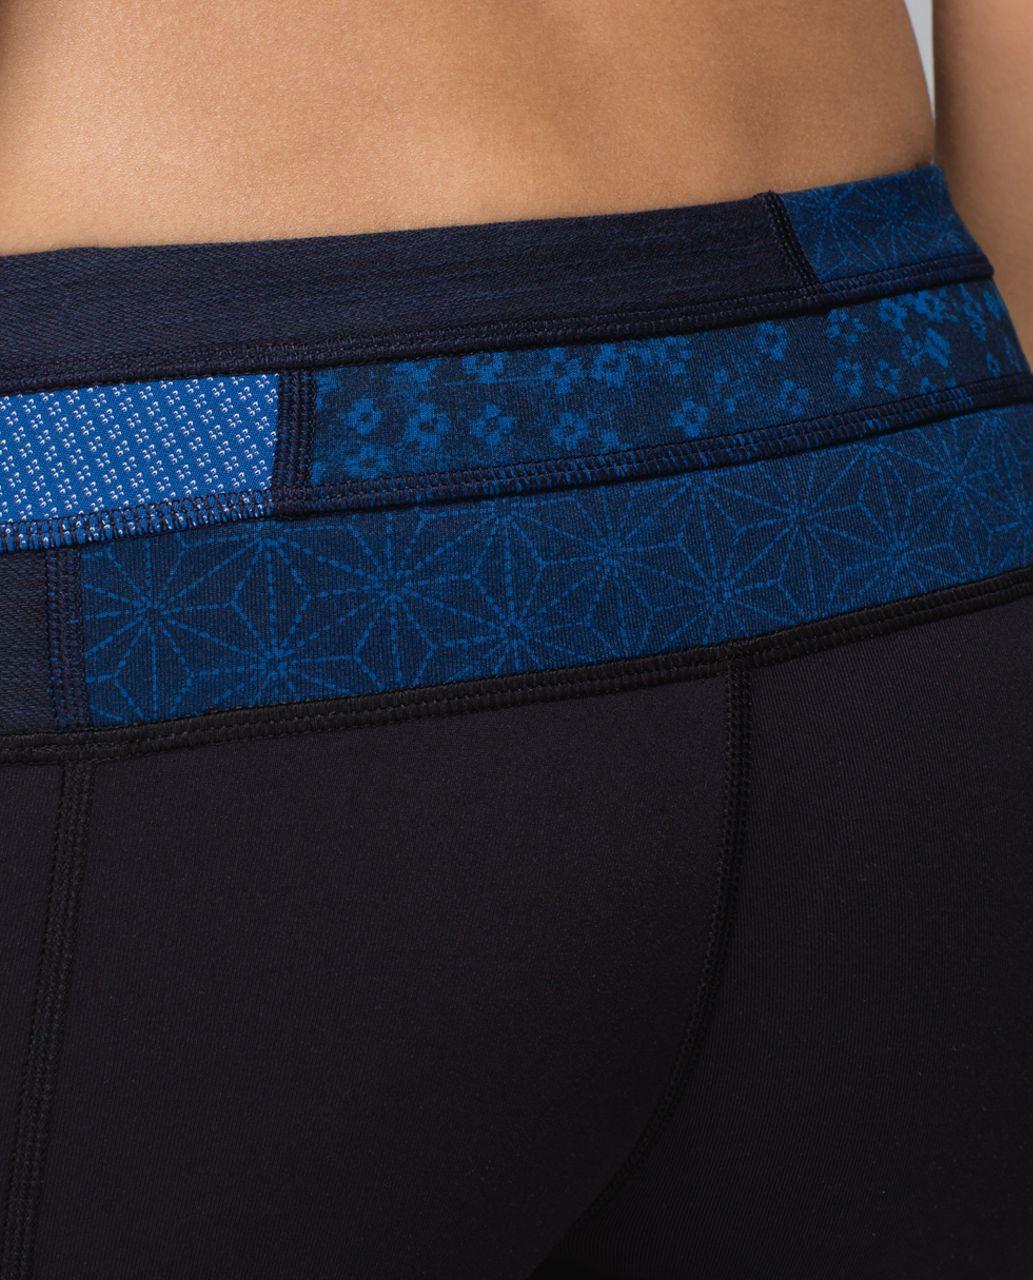 Lululemon Groove Pant *Full-On Luon (Regular) - Black / Fa14 Quilt 2 / Sashico Cross Inkwell Rugged Blue